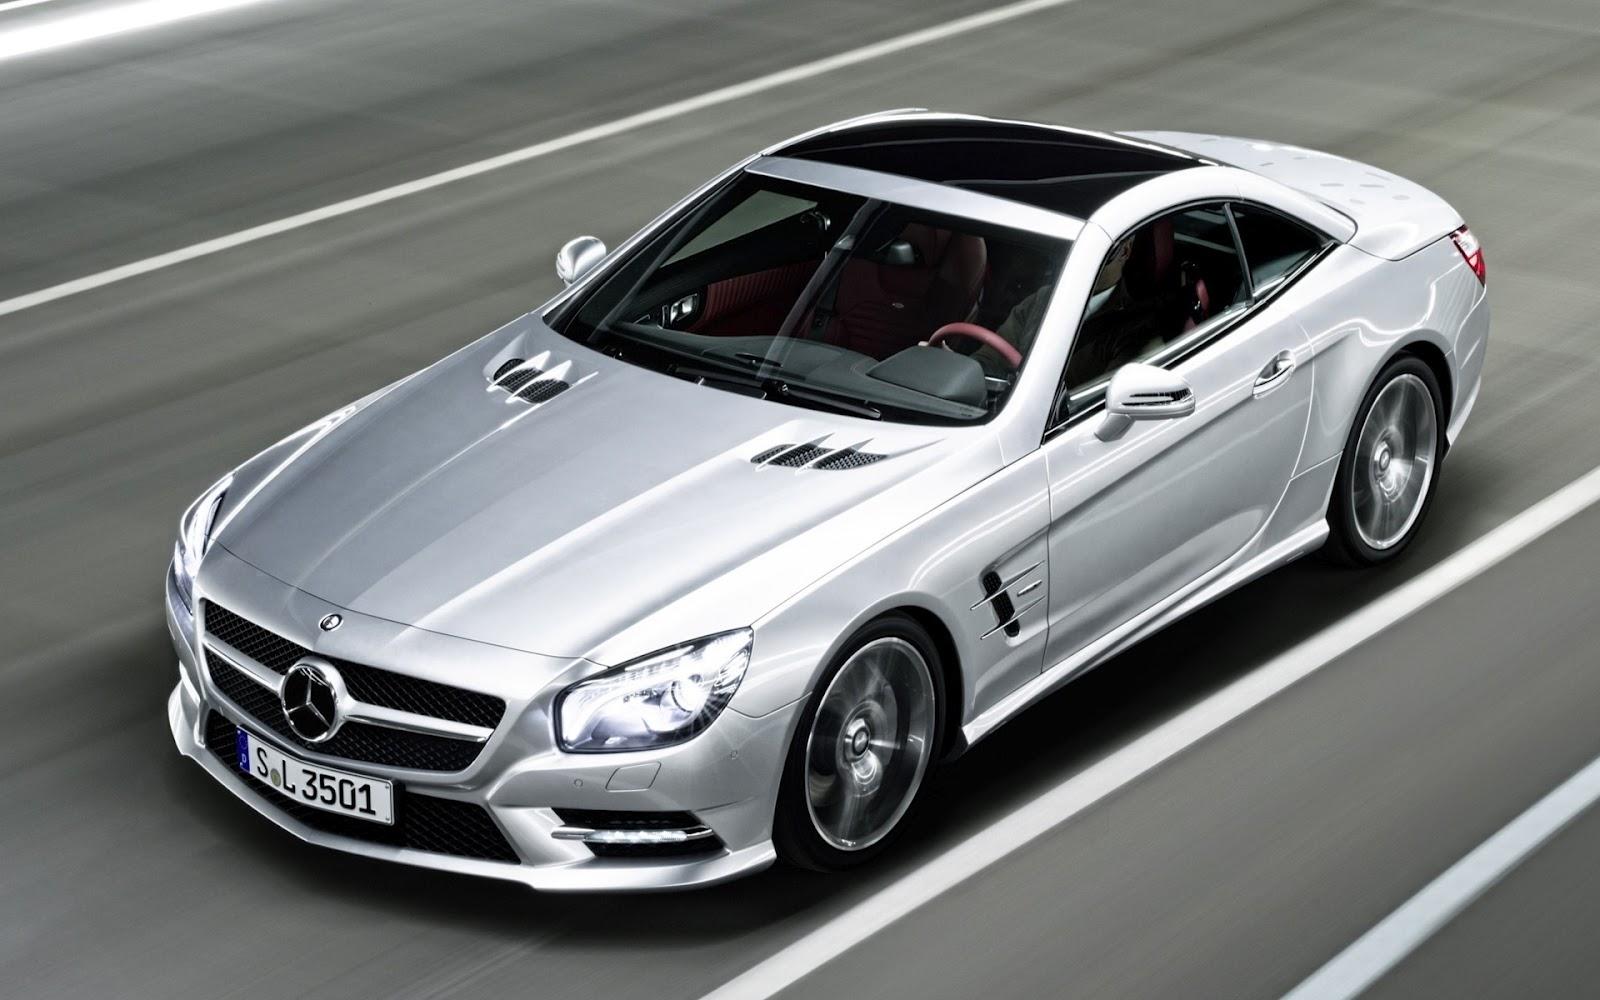 http://1.bp.blogspot.com/-QmrTEelxdpg/UFseeaQ1pmI/AAAAAAAAni8/QLULyPDszNE/s1600/Mercedes-Benz-SL350-AMG-Wallpapers_Fondos-de-Pantalla-de-Carros.jpg